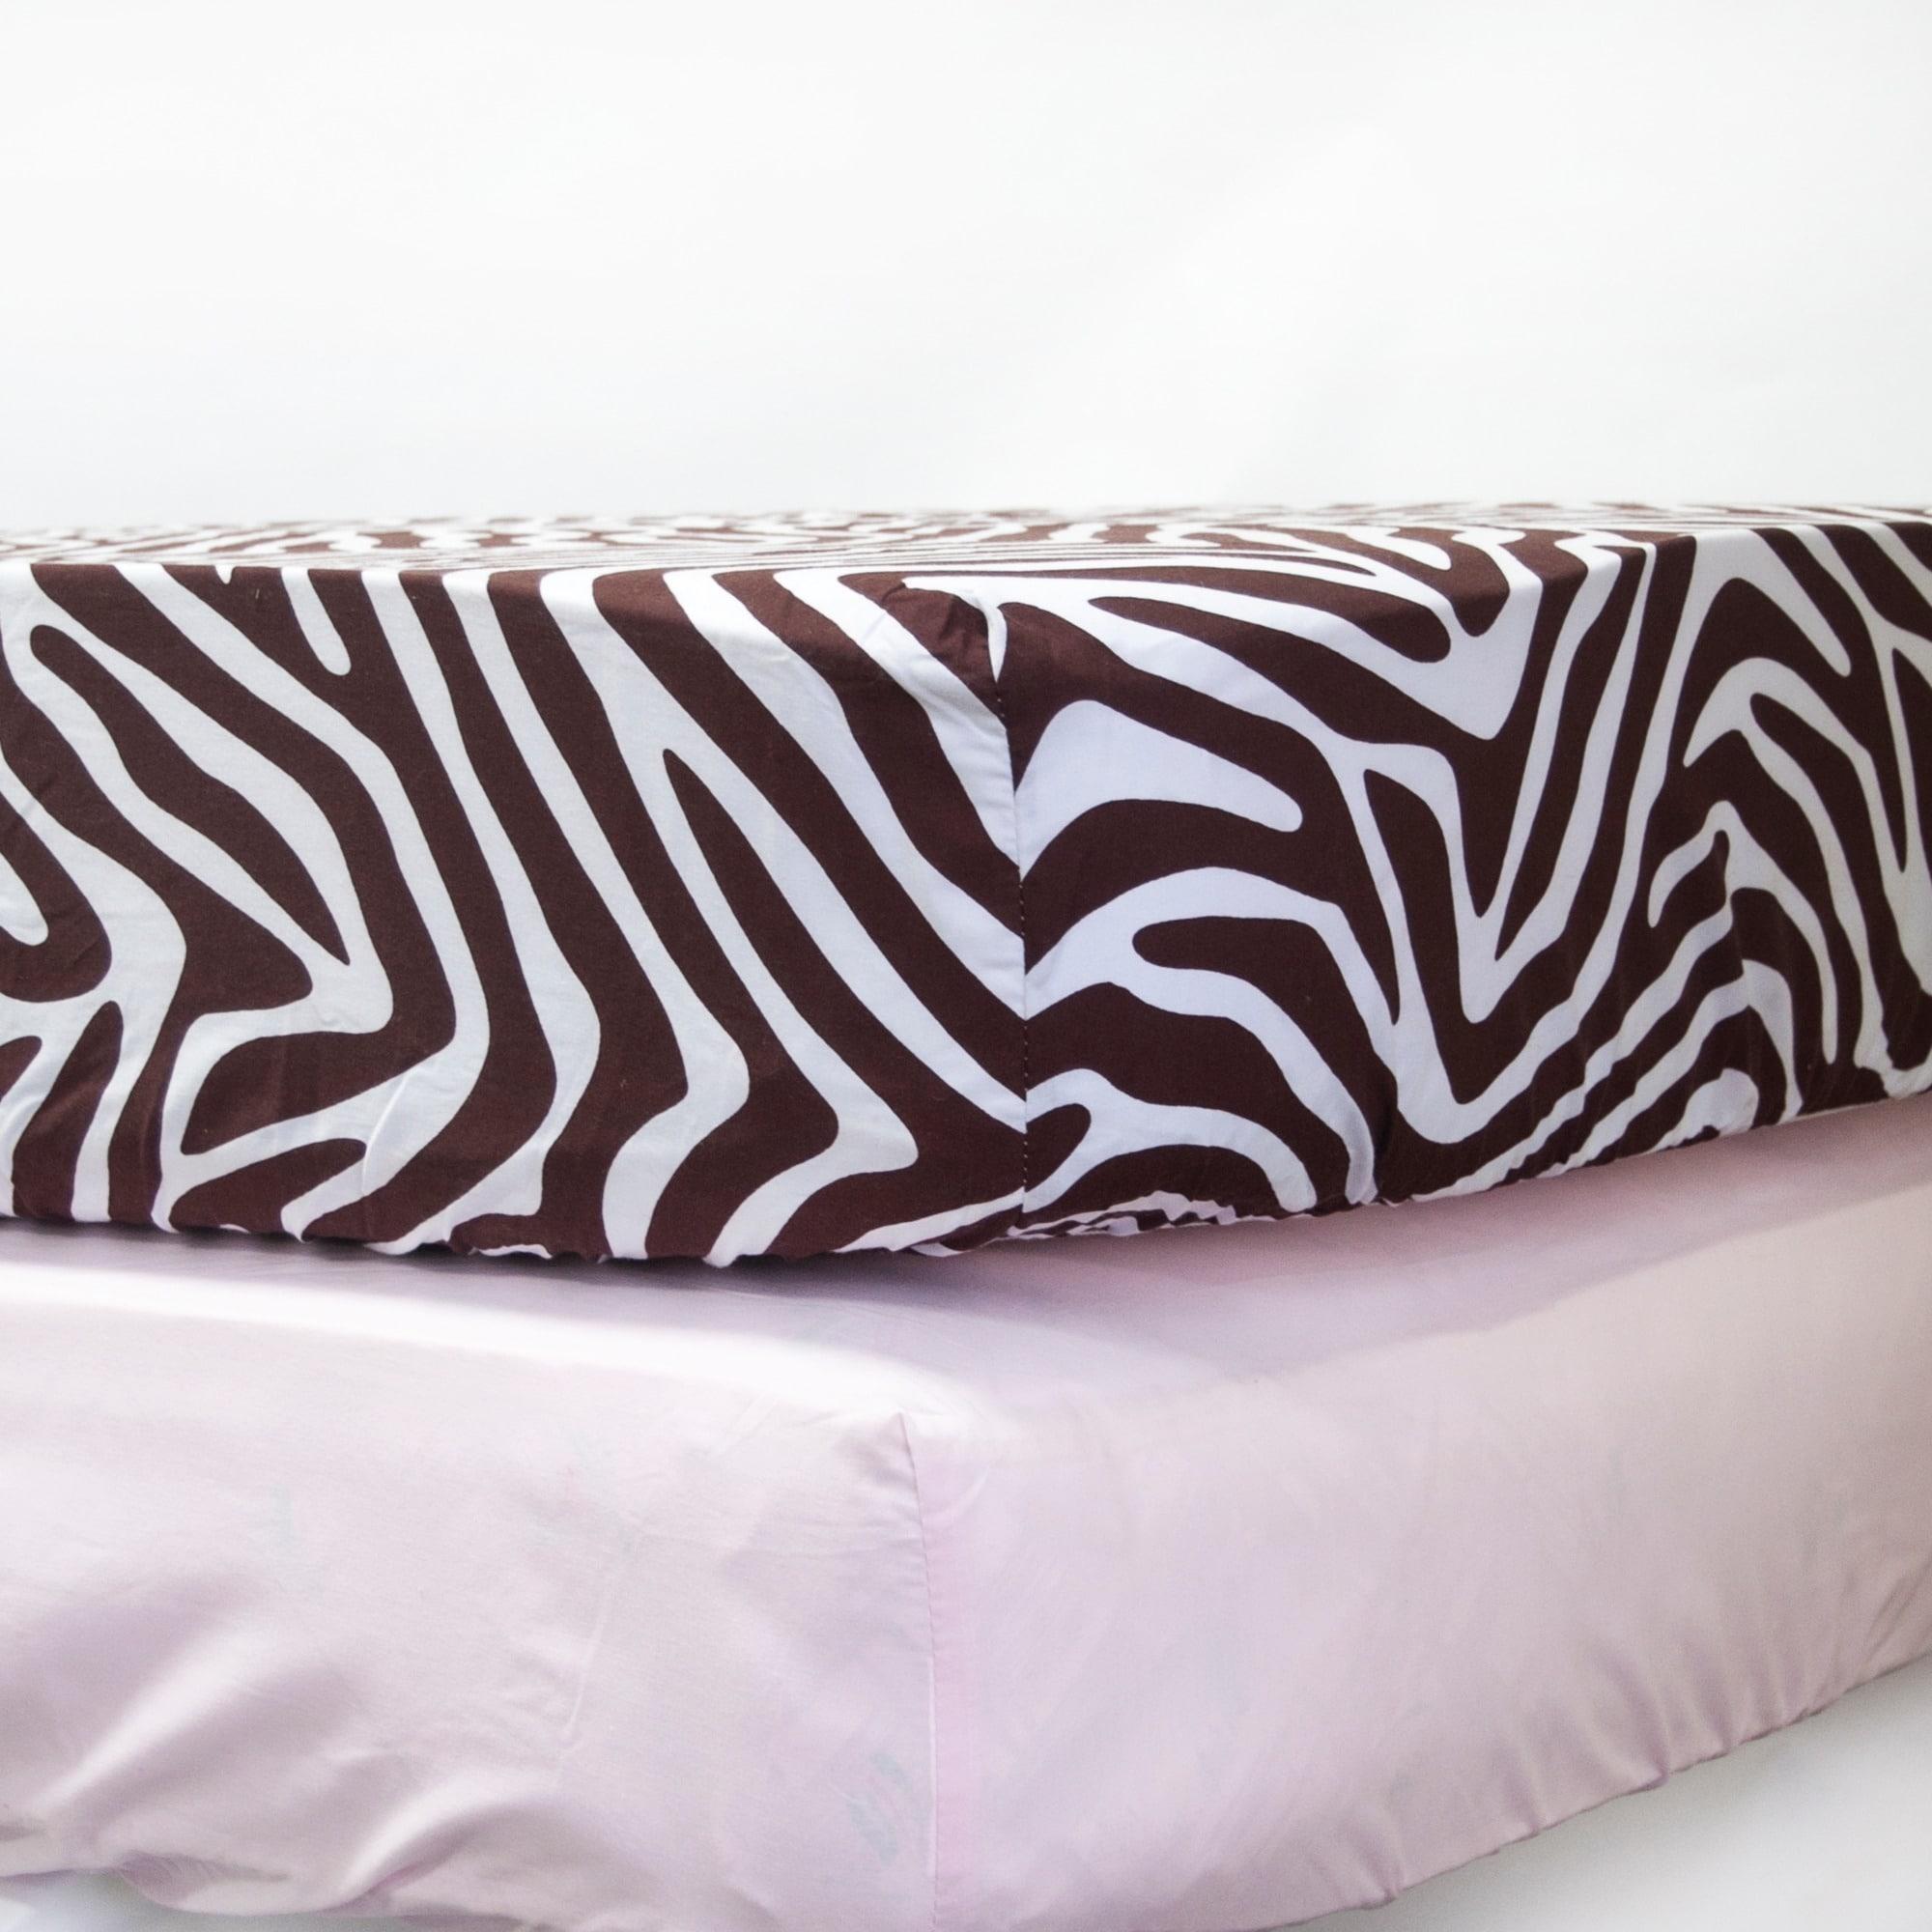 Pam Grace Creations Zara Zebra Crib Sheets (Set of 2) (Za...